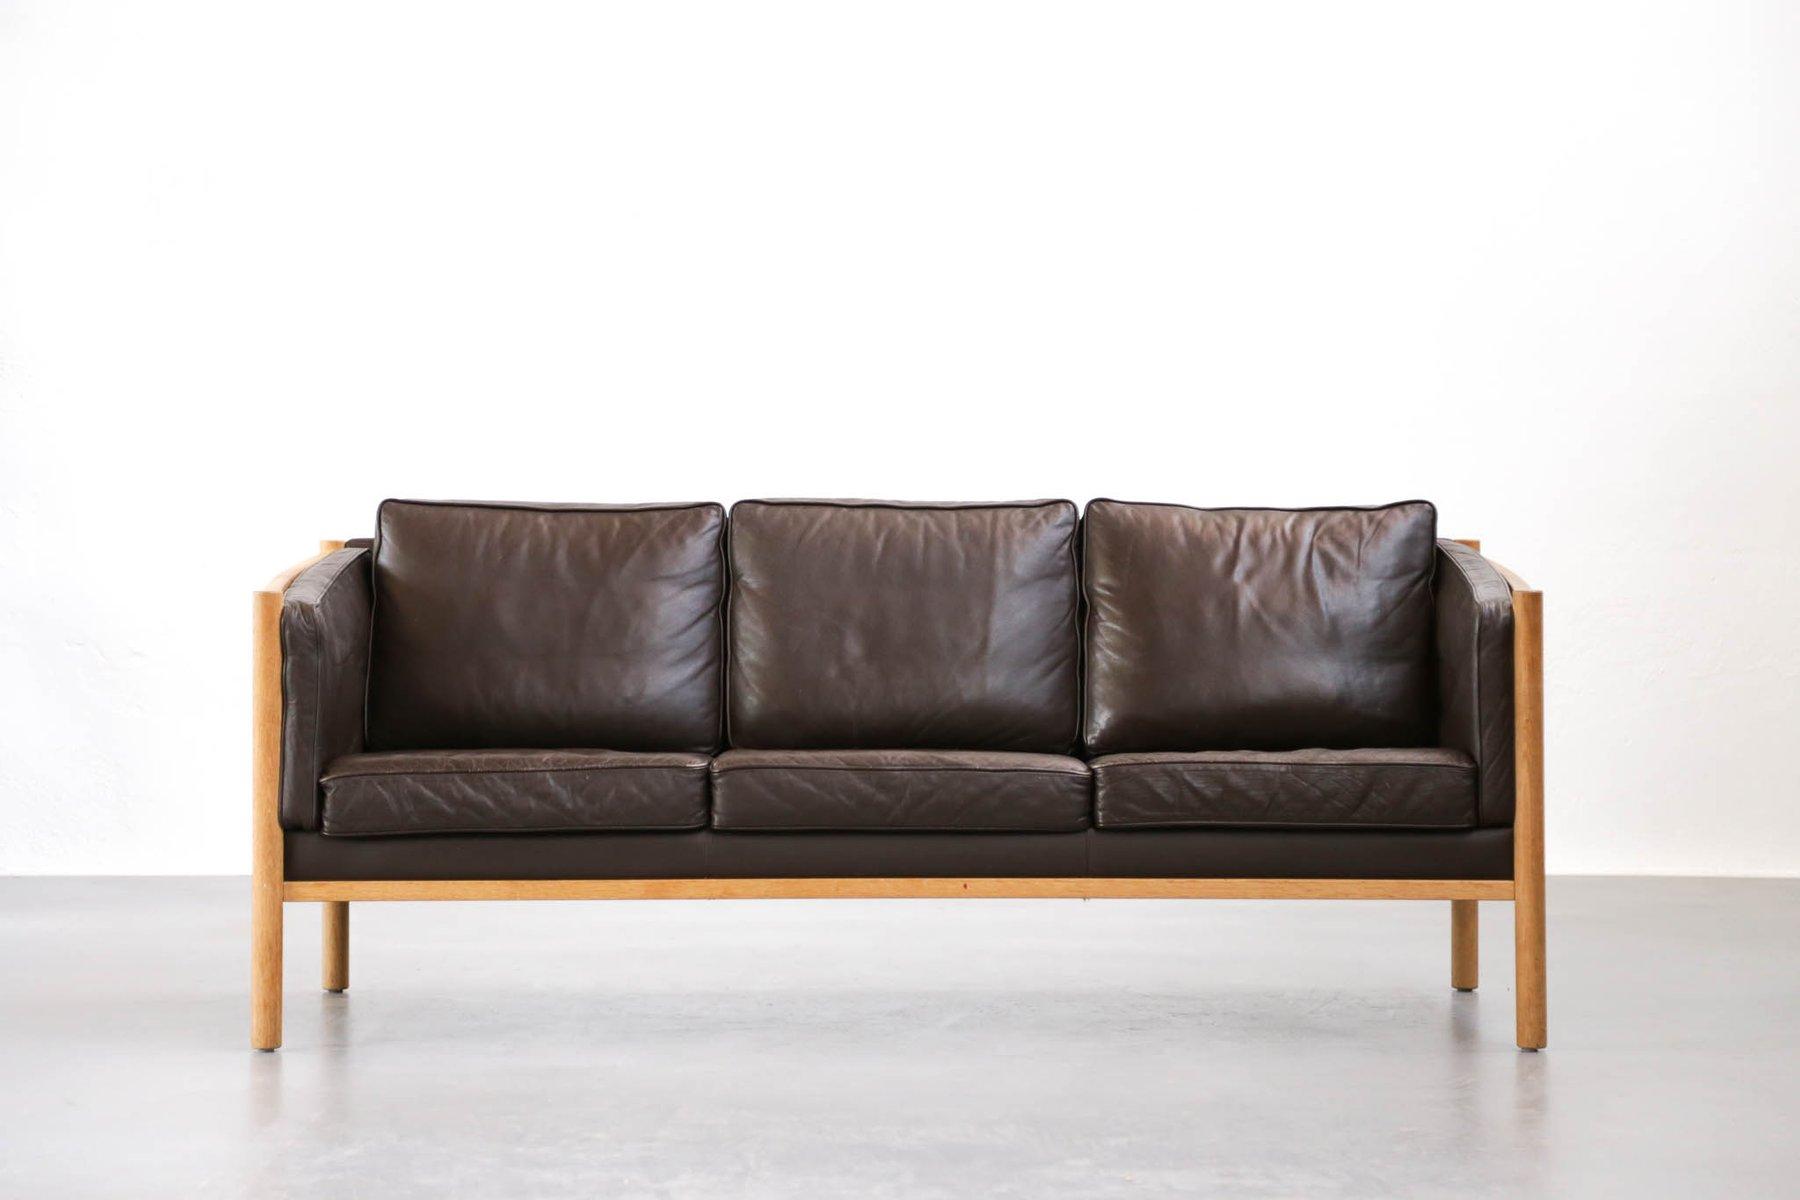 skandinavisches braunes mid century ledersofa 1970er bei. Black Bedroom Furniture Sets. Home Design Ideas